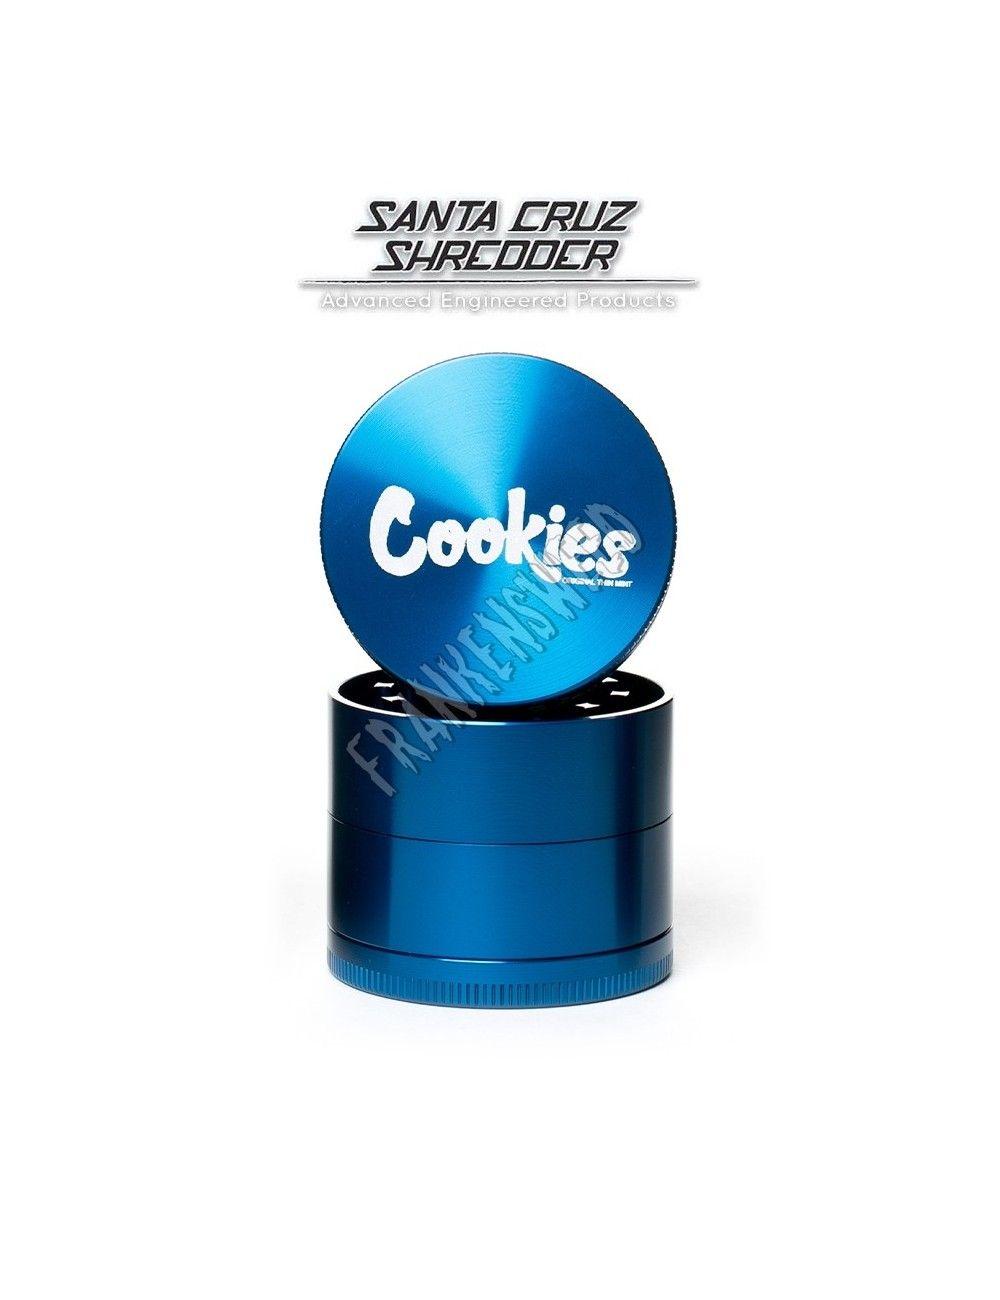 Santa Cruz Shredder 4-piece Medium - Blue Cookies